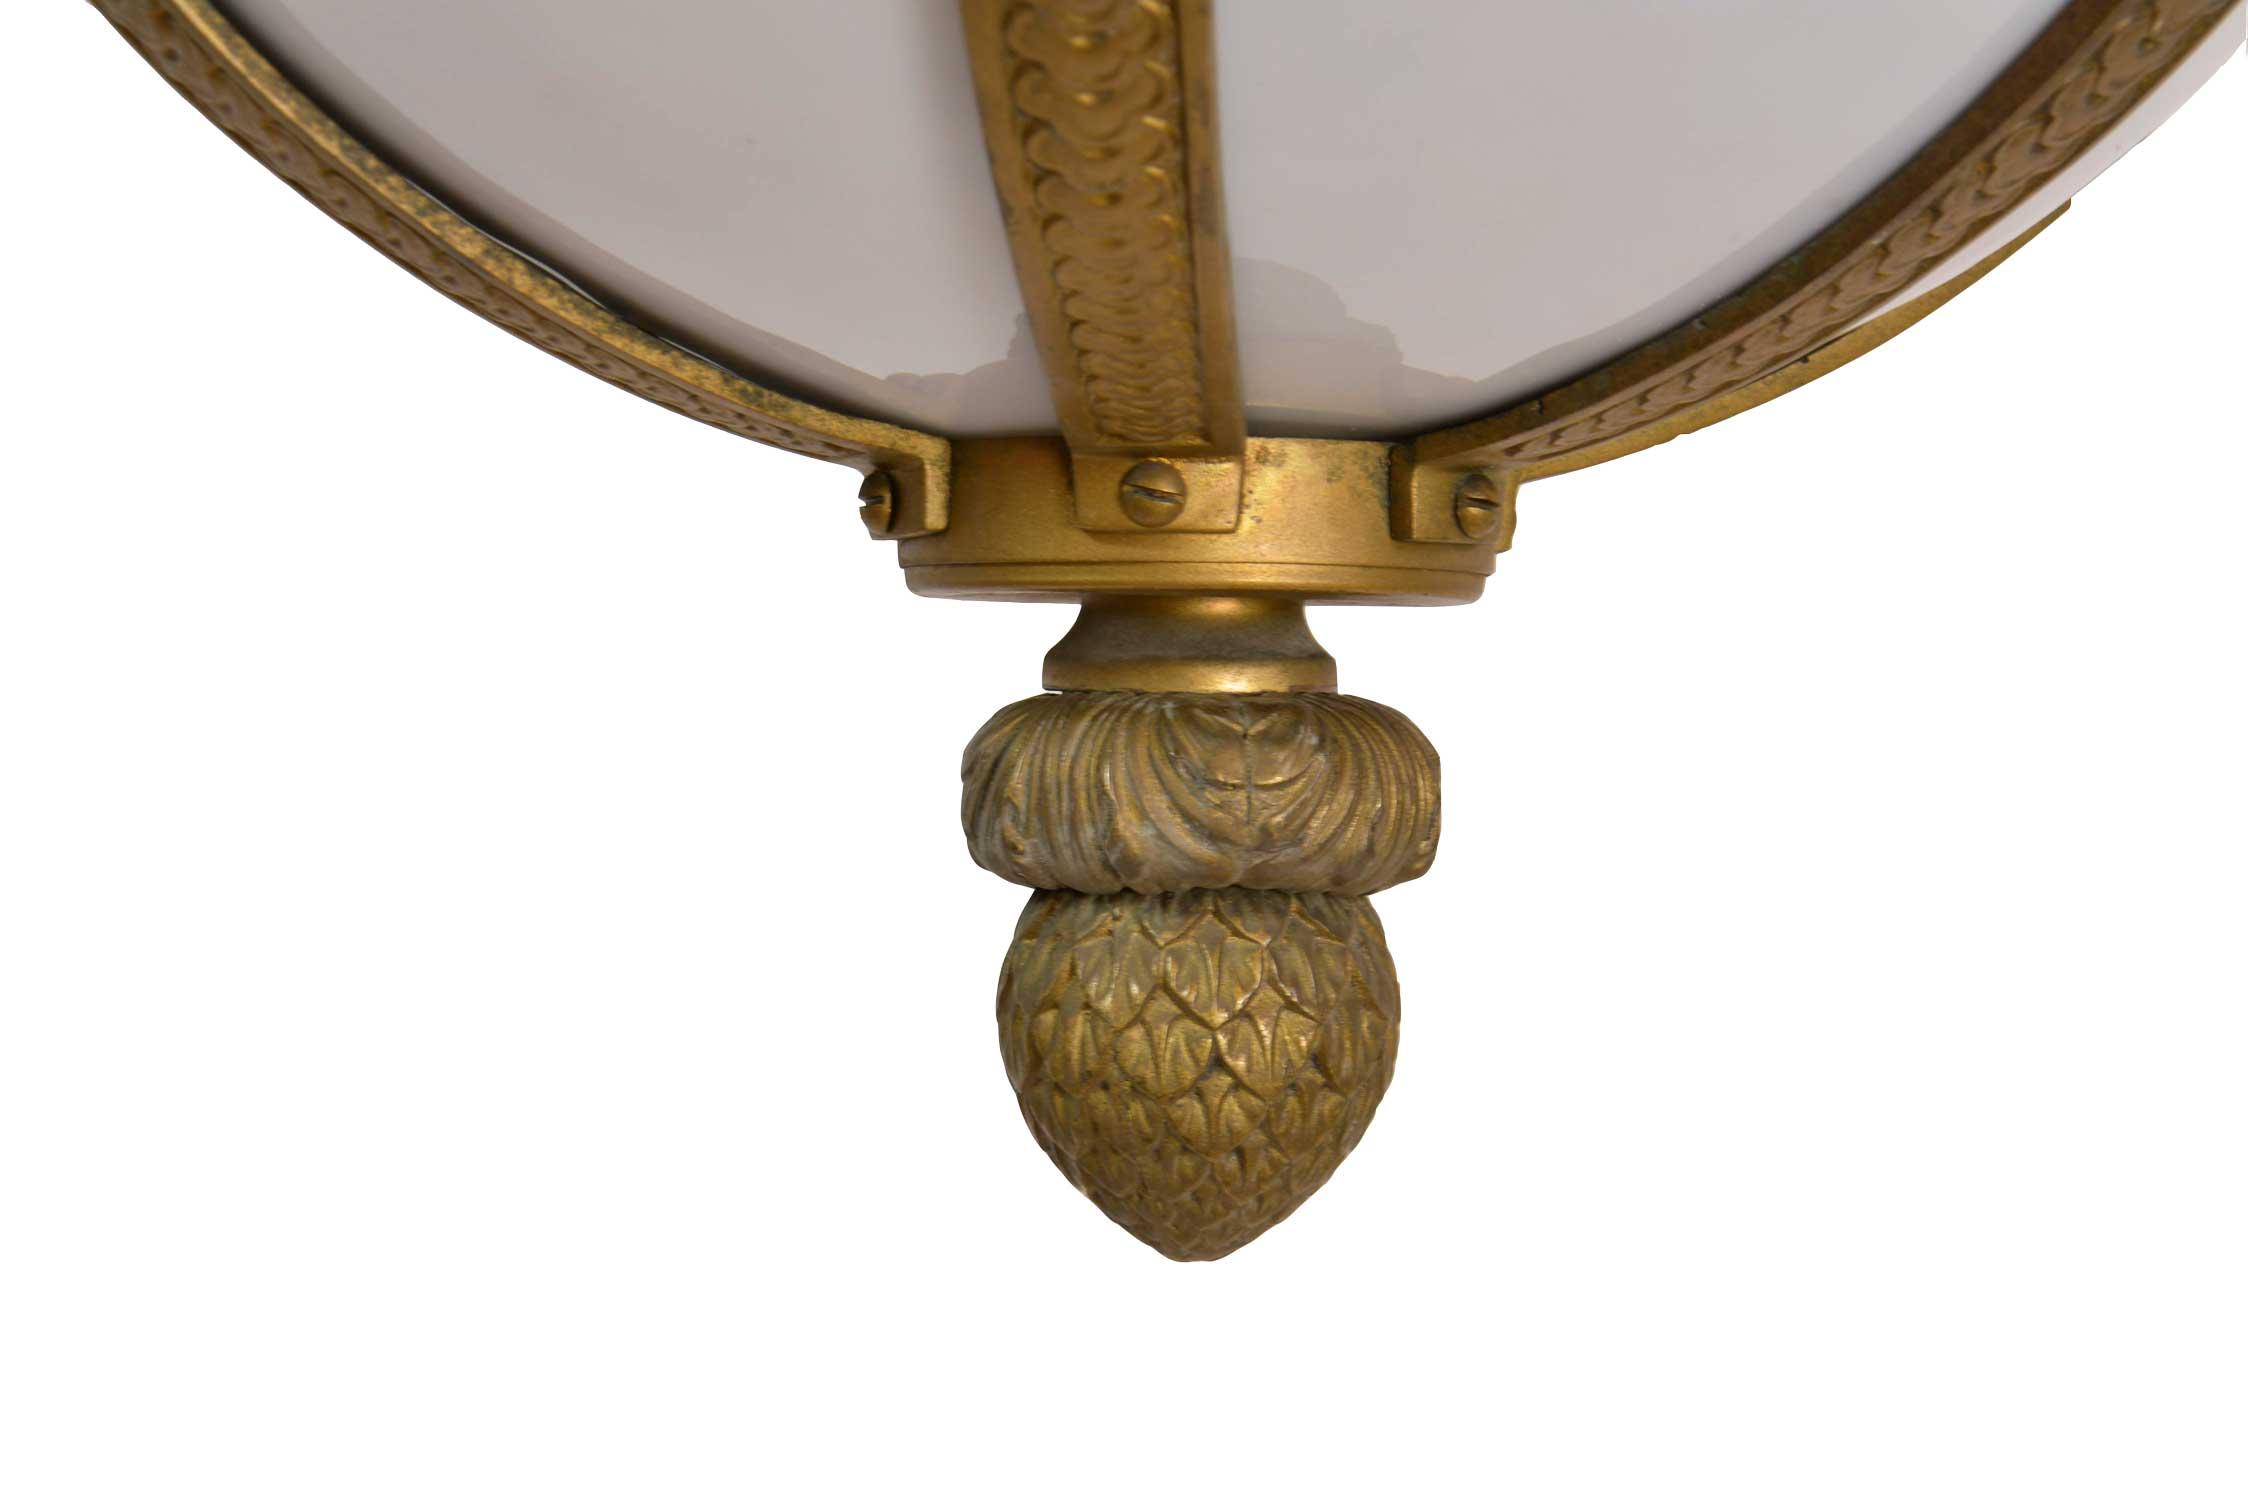 46136-Brass-Light-with-Bent-Glass-close-up-of-bulb.jpg